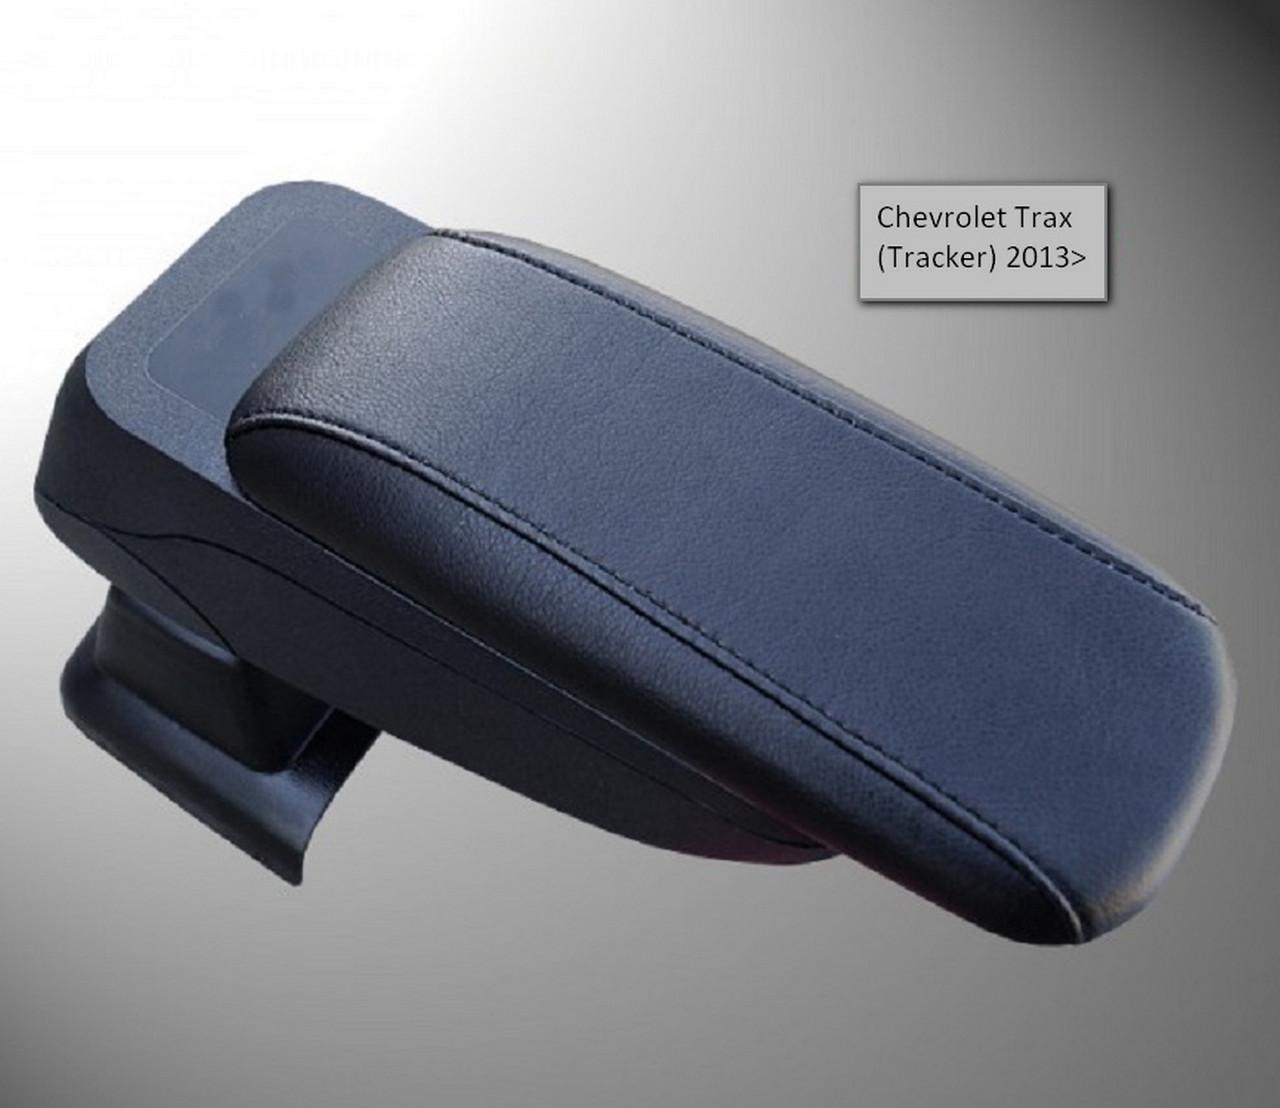 ARS3CHCIK00158 Armcik S2 armrest Chevrolet Tracker / Trax 2012>